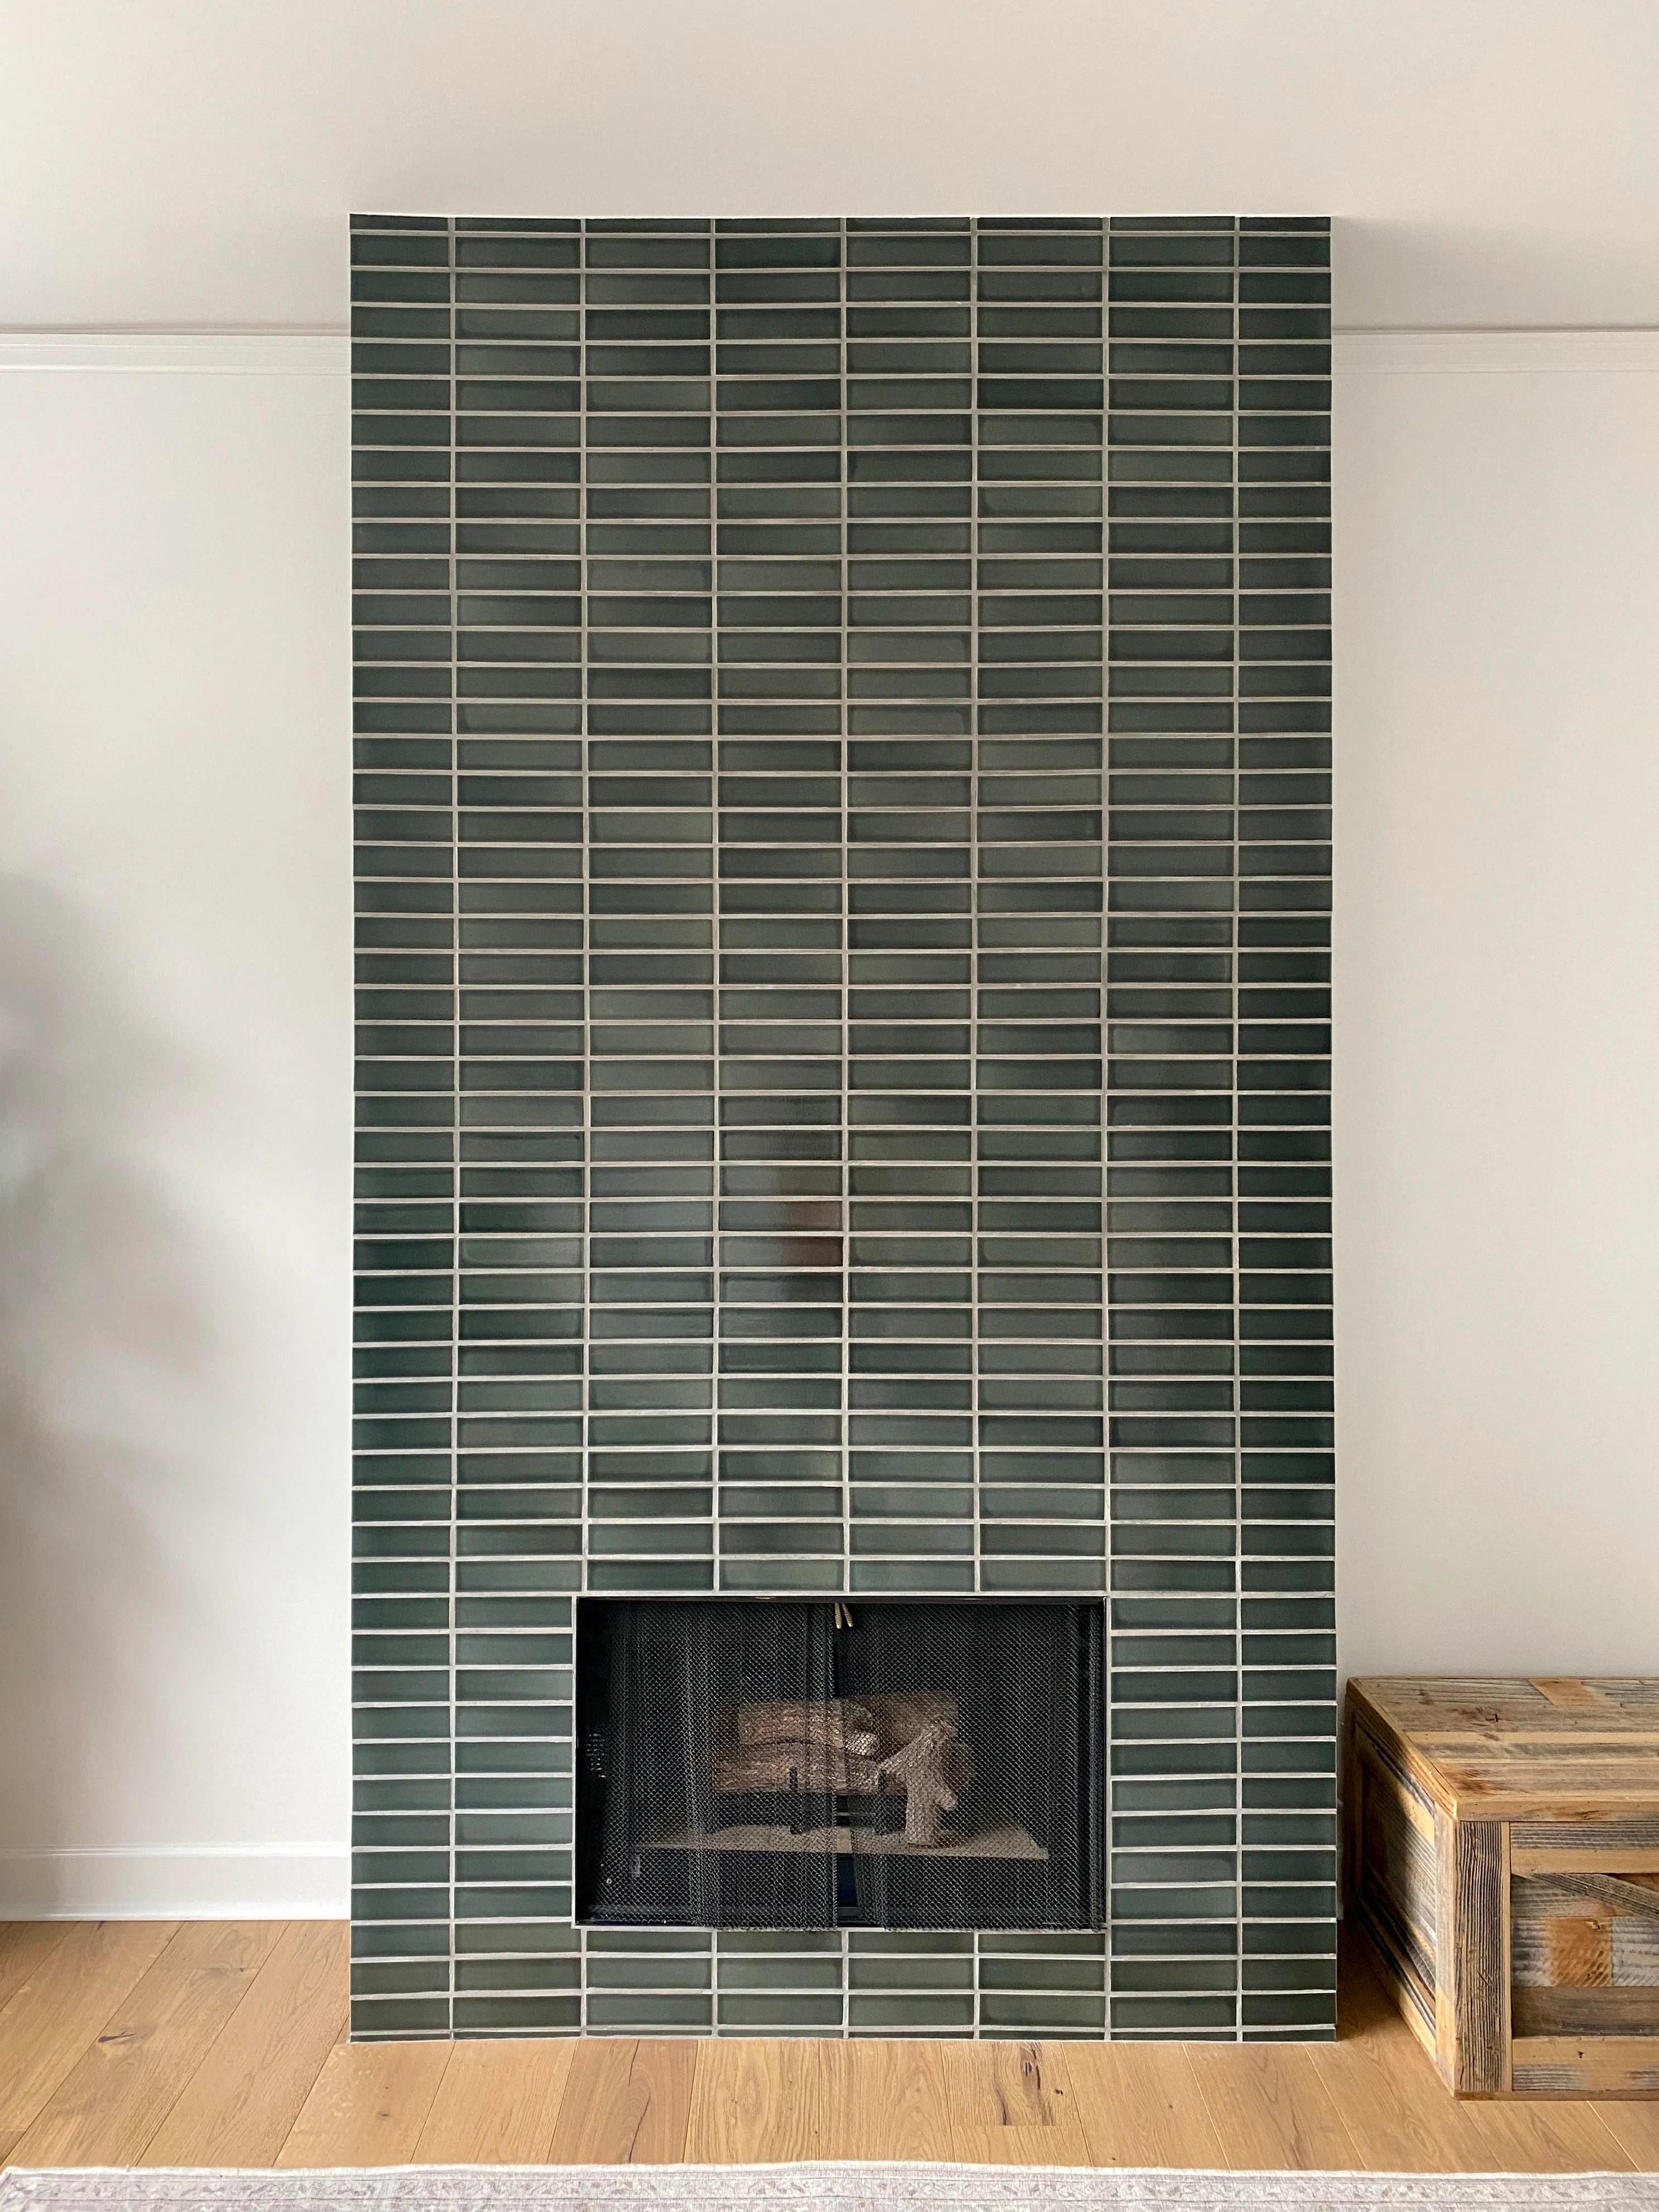 fireplace tiles in dark green